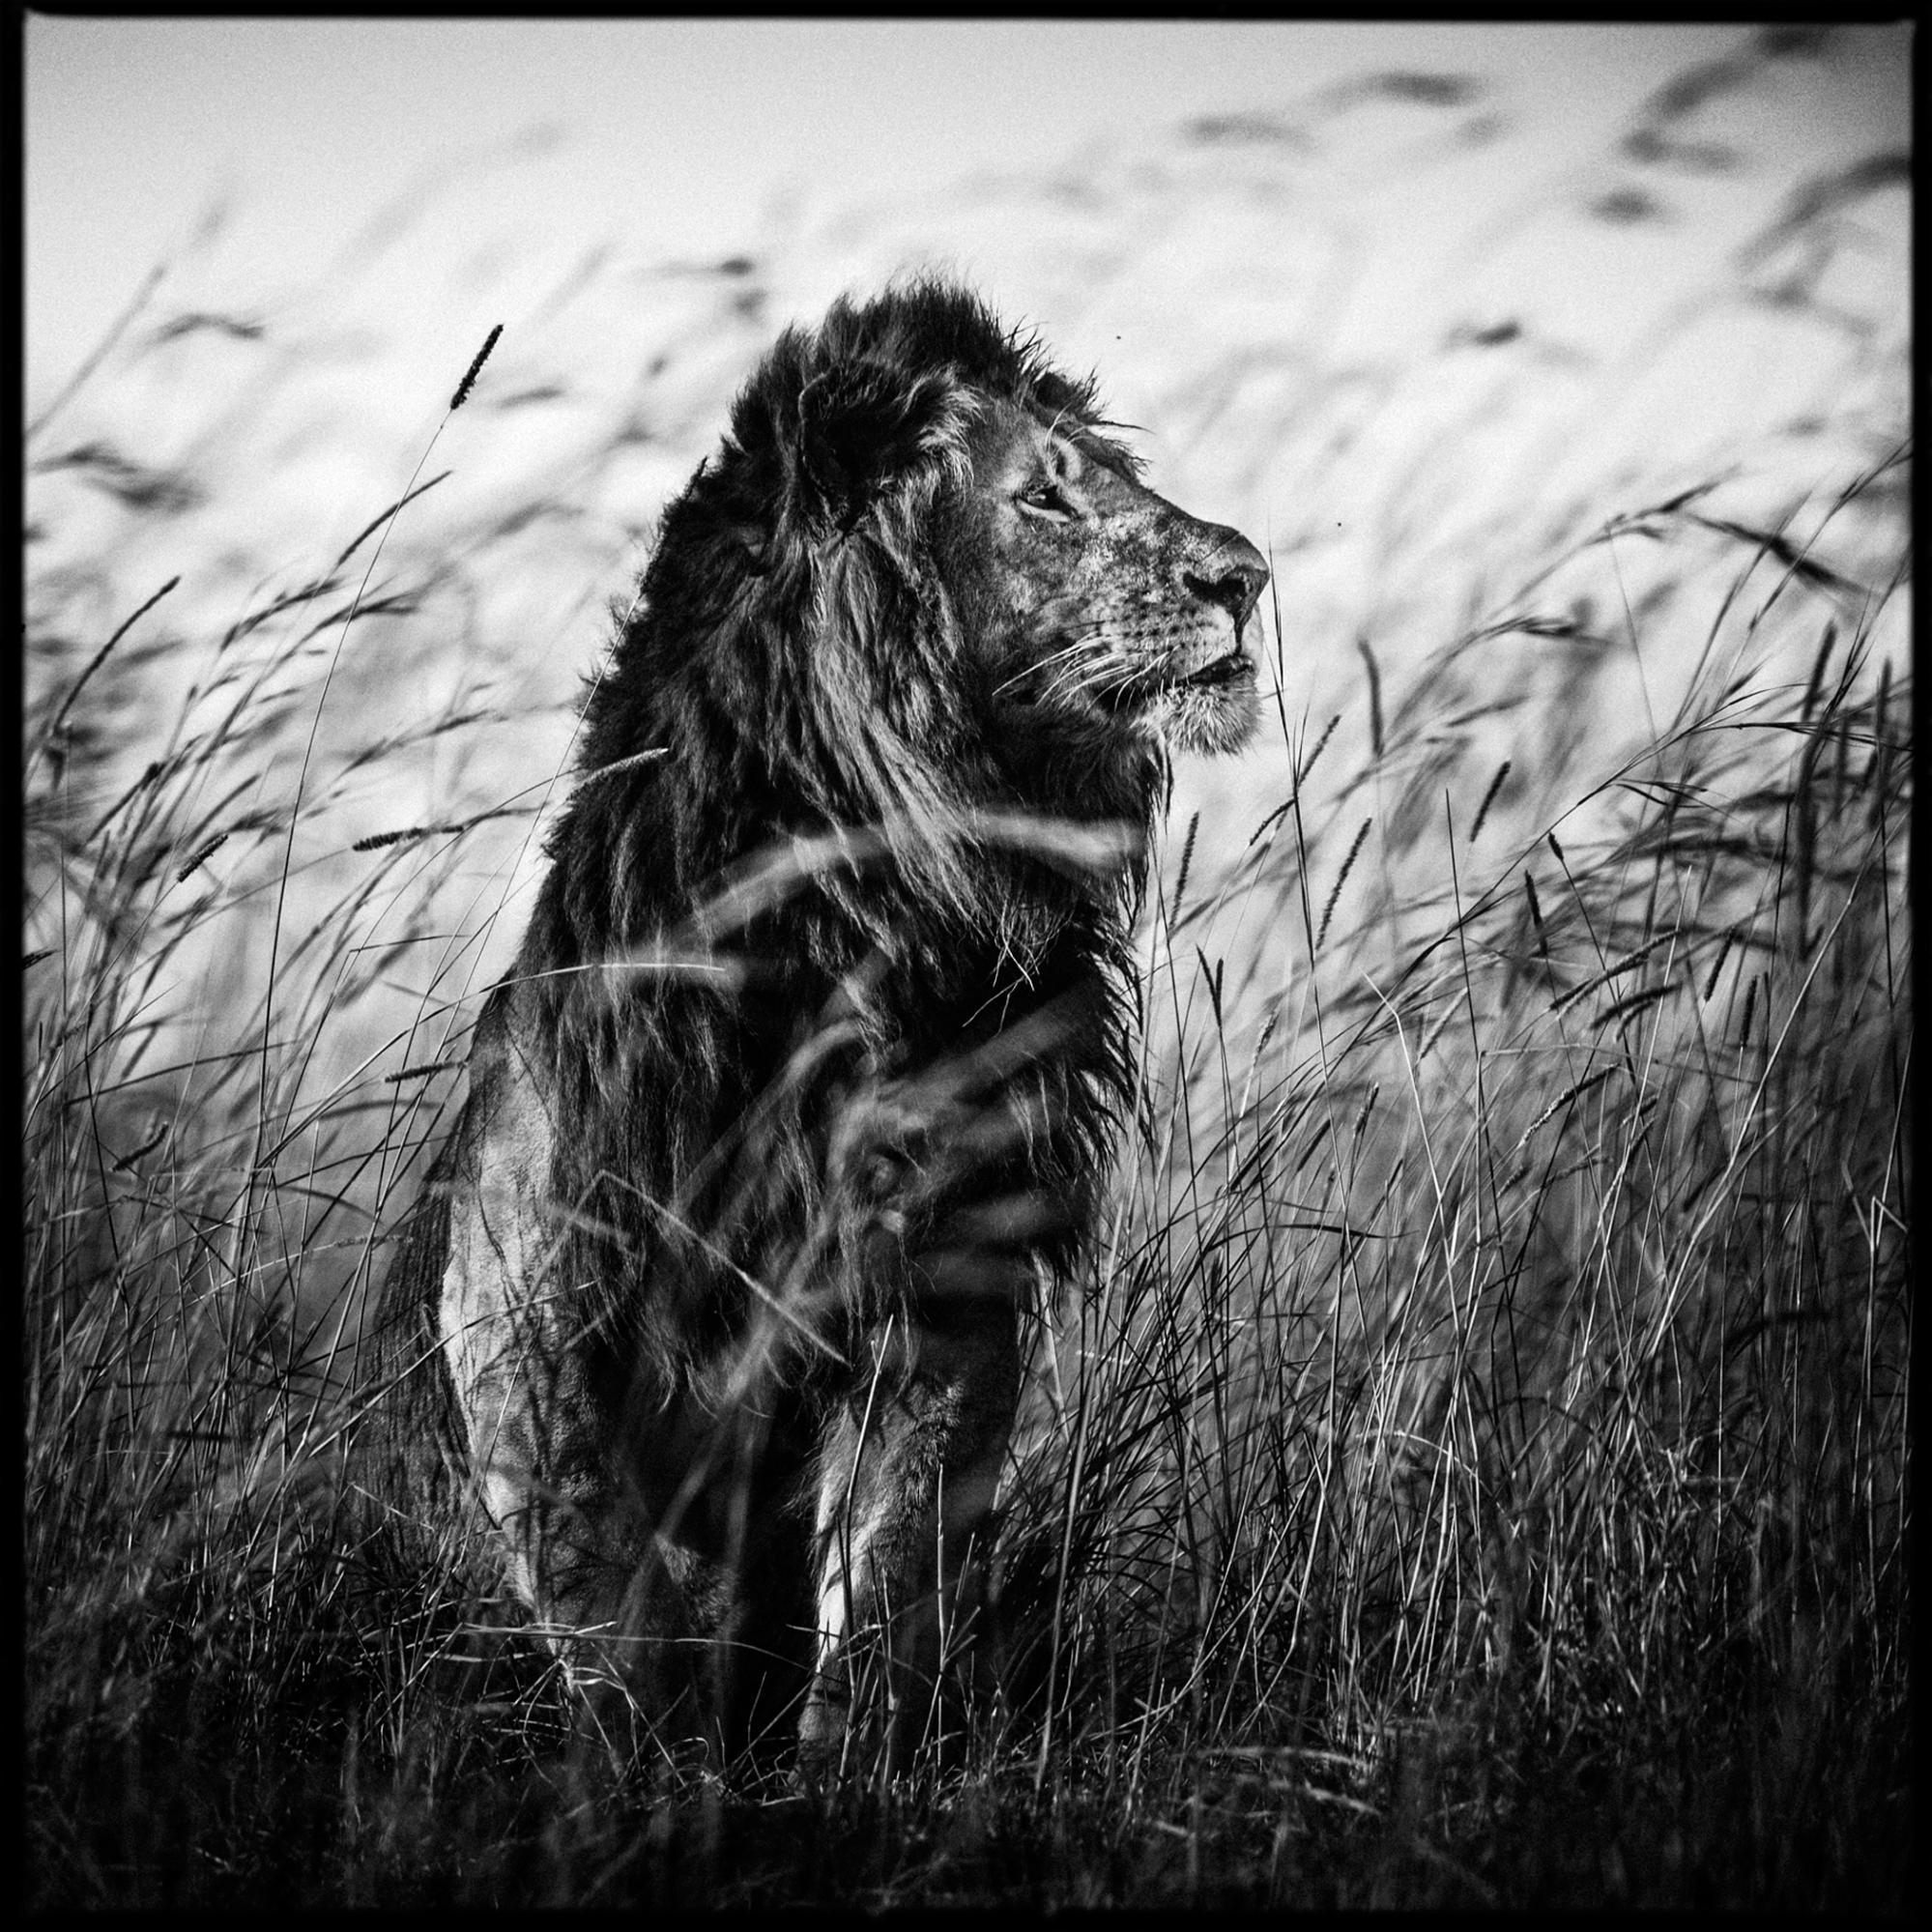 Lion in the grass, Kenya, 2013